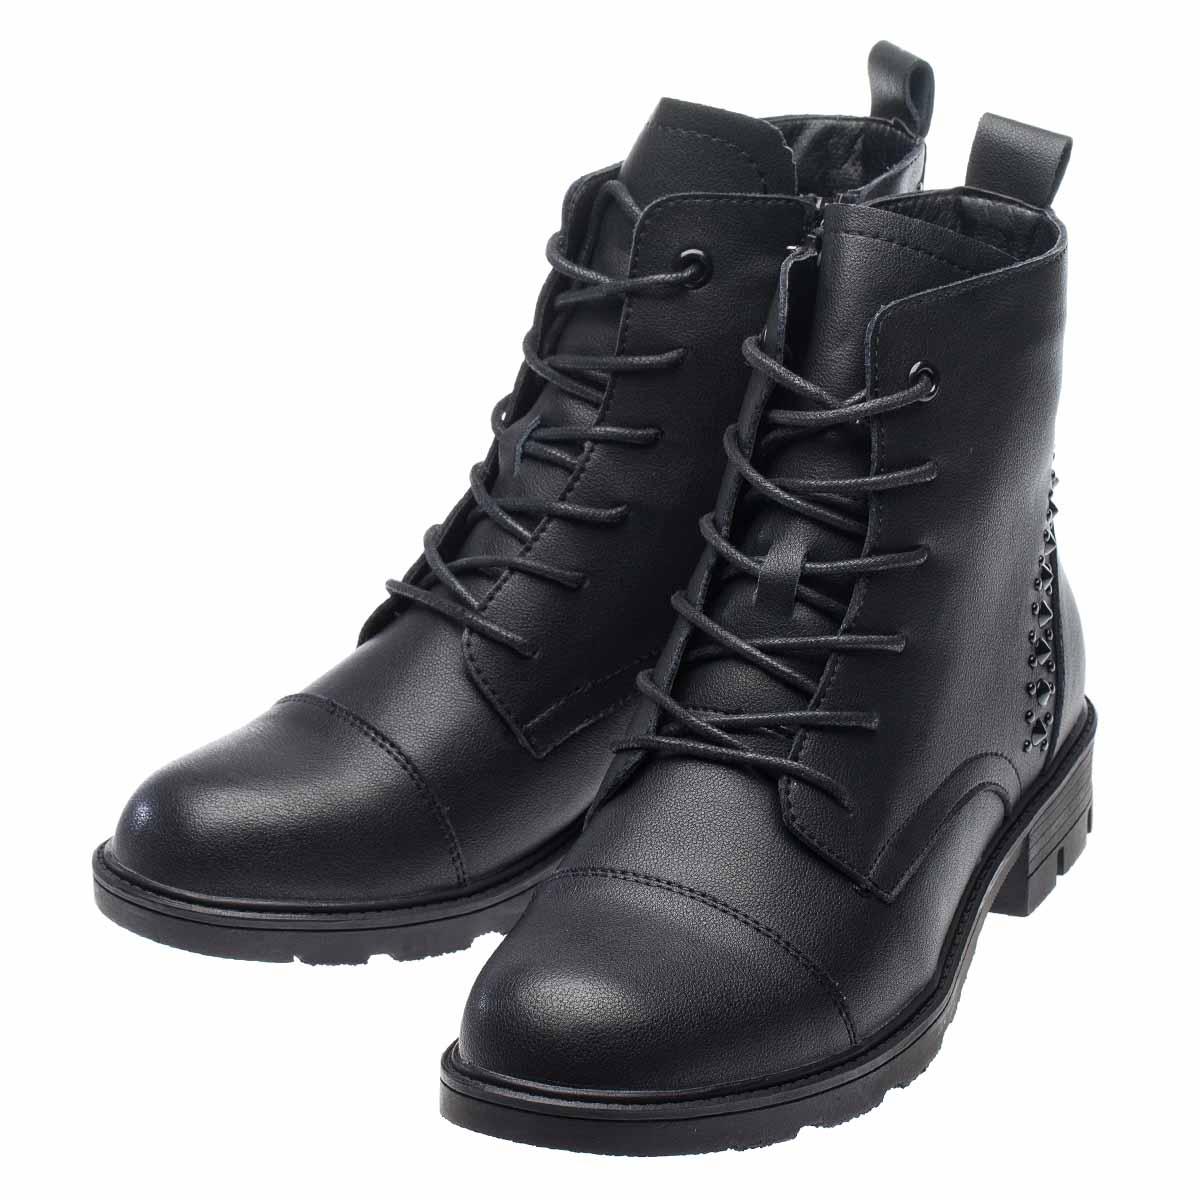 Ботинки демисезонные FERTO, DN18-6781A